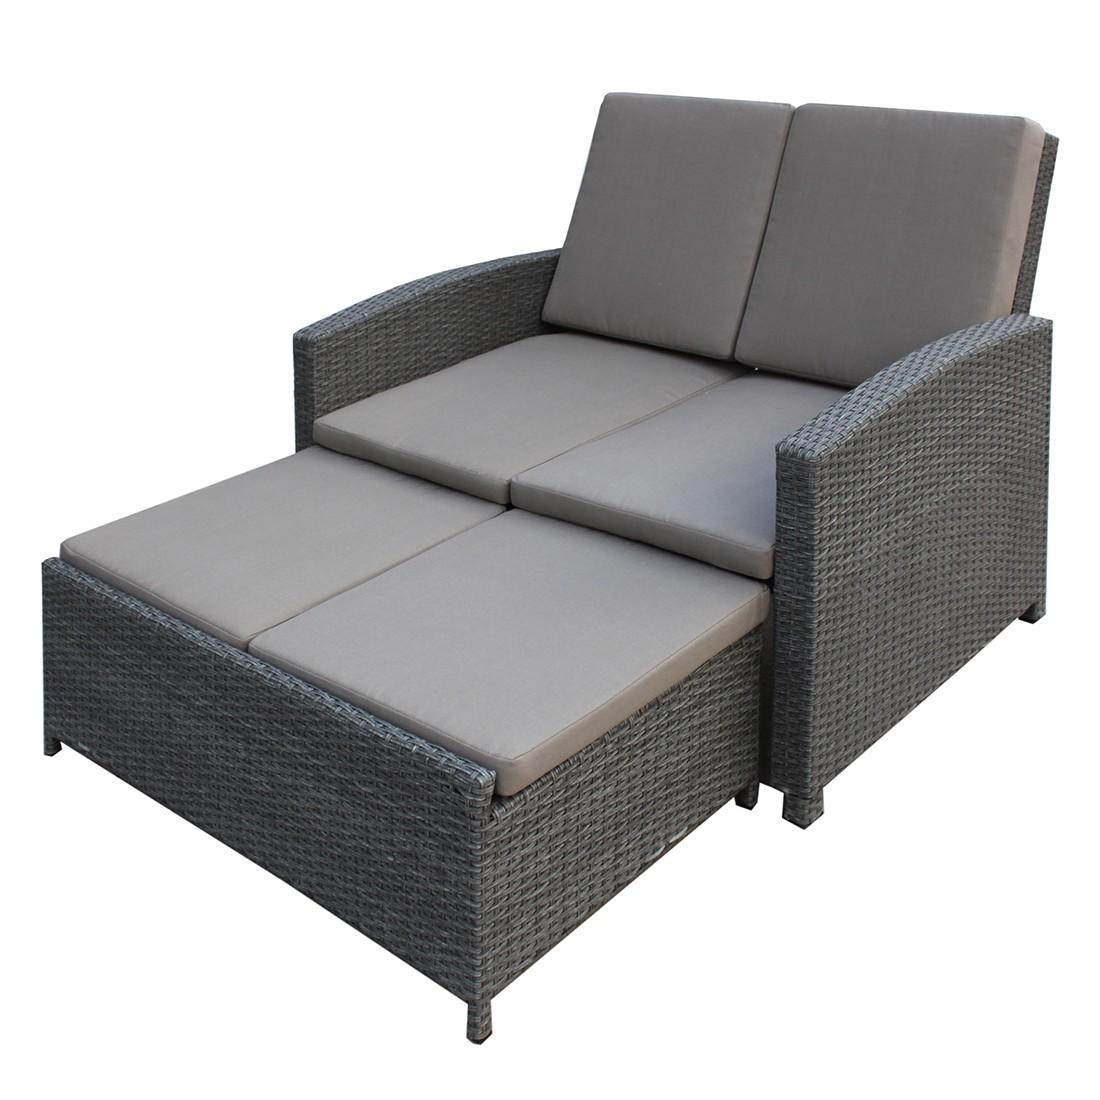 Gartensofa Villanova (inkl. Hocker) – Polyrattan Grau/Textil Grau, Garden Guerilla kaufen